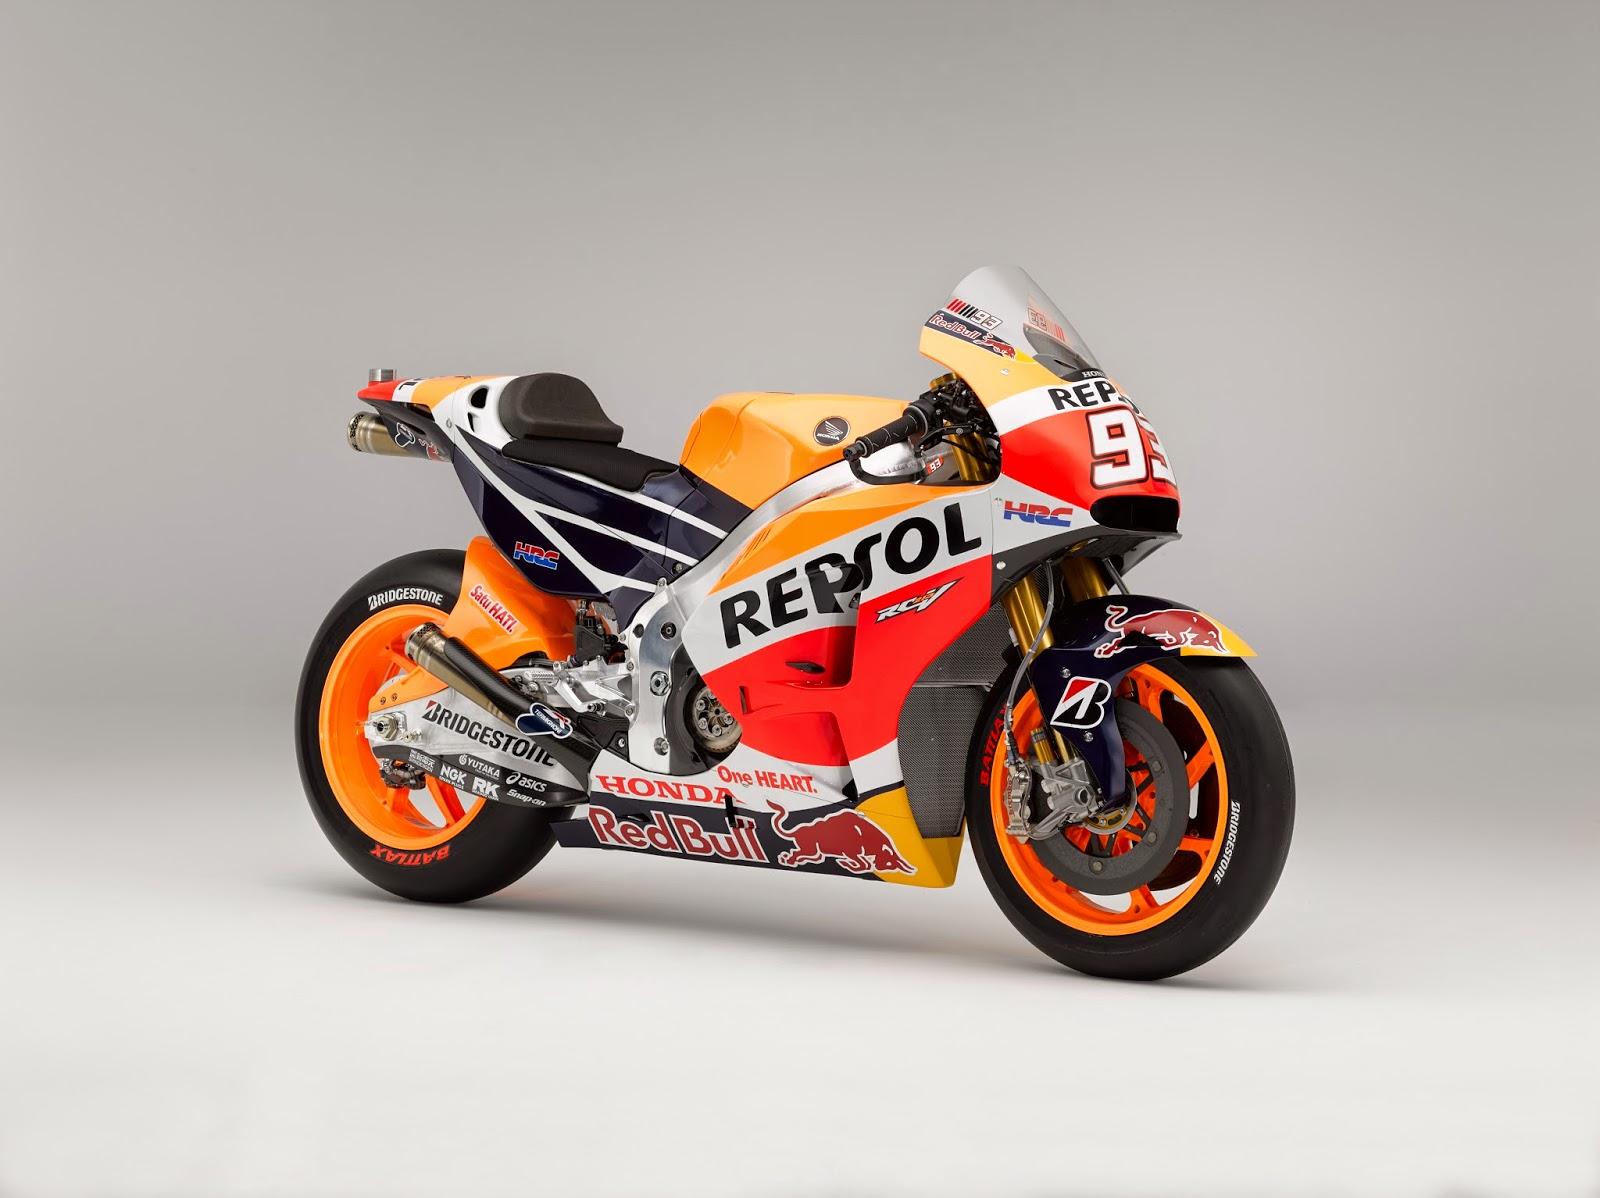 Honda Racing Moto Gp: Racing Cafè: Honda RC 213V Repsol Honda Team MotoGP 2015